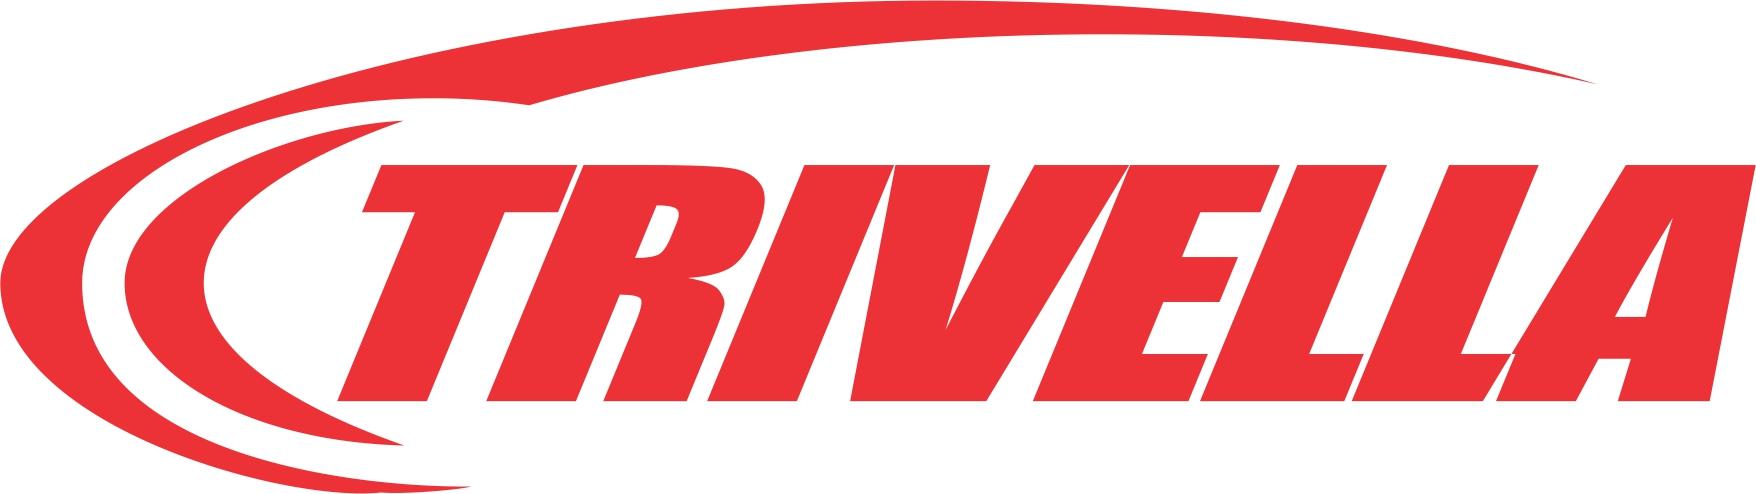 a435777520c28 logo trivella 1 – Trivella Empreendimentos Esportivos